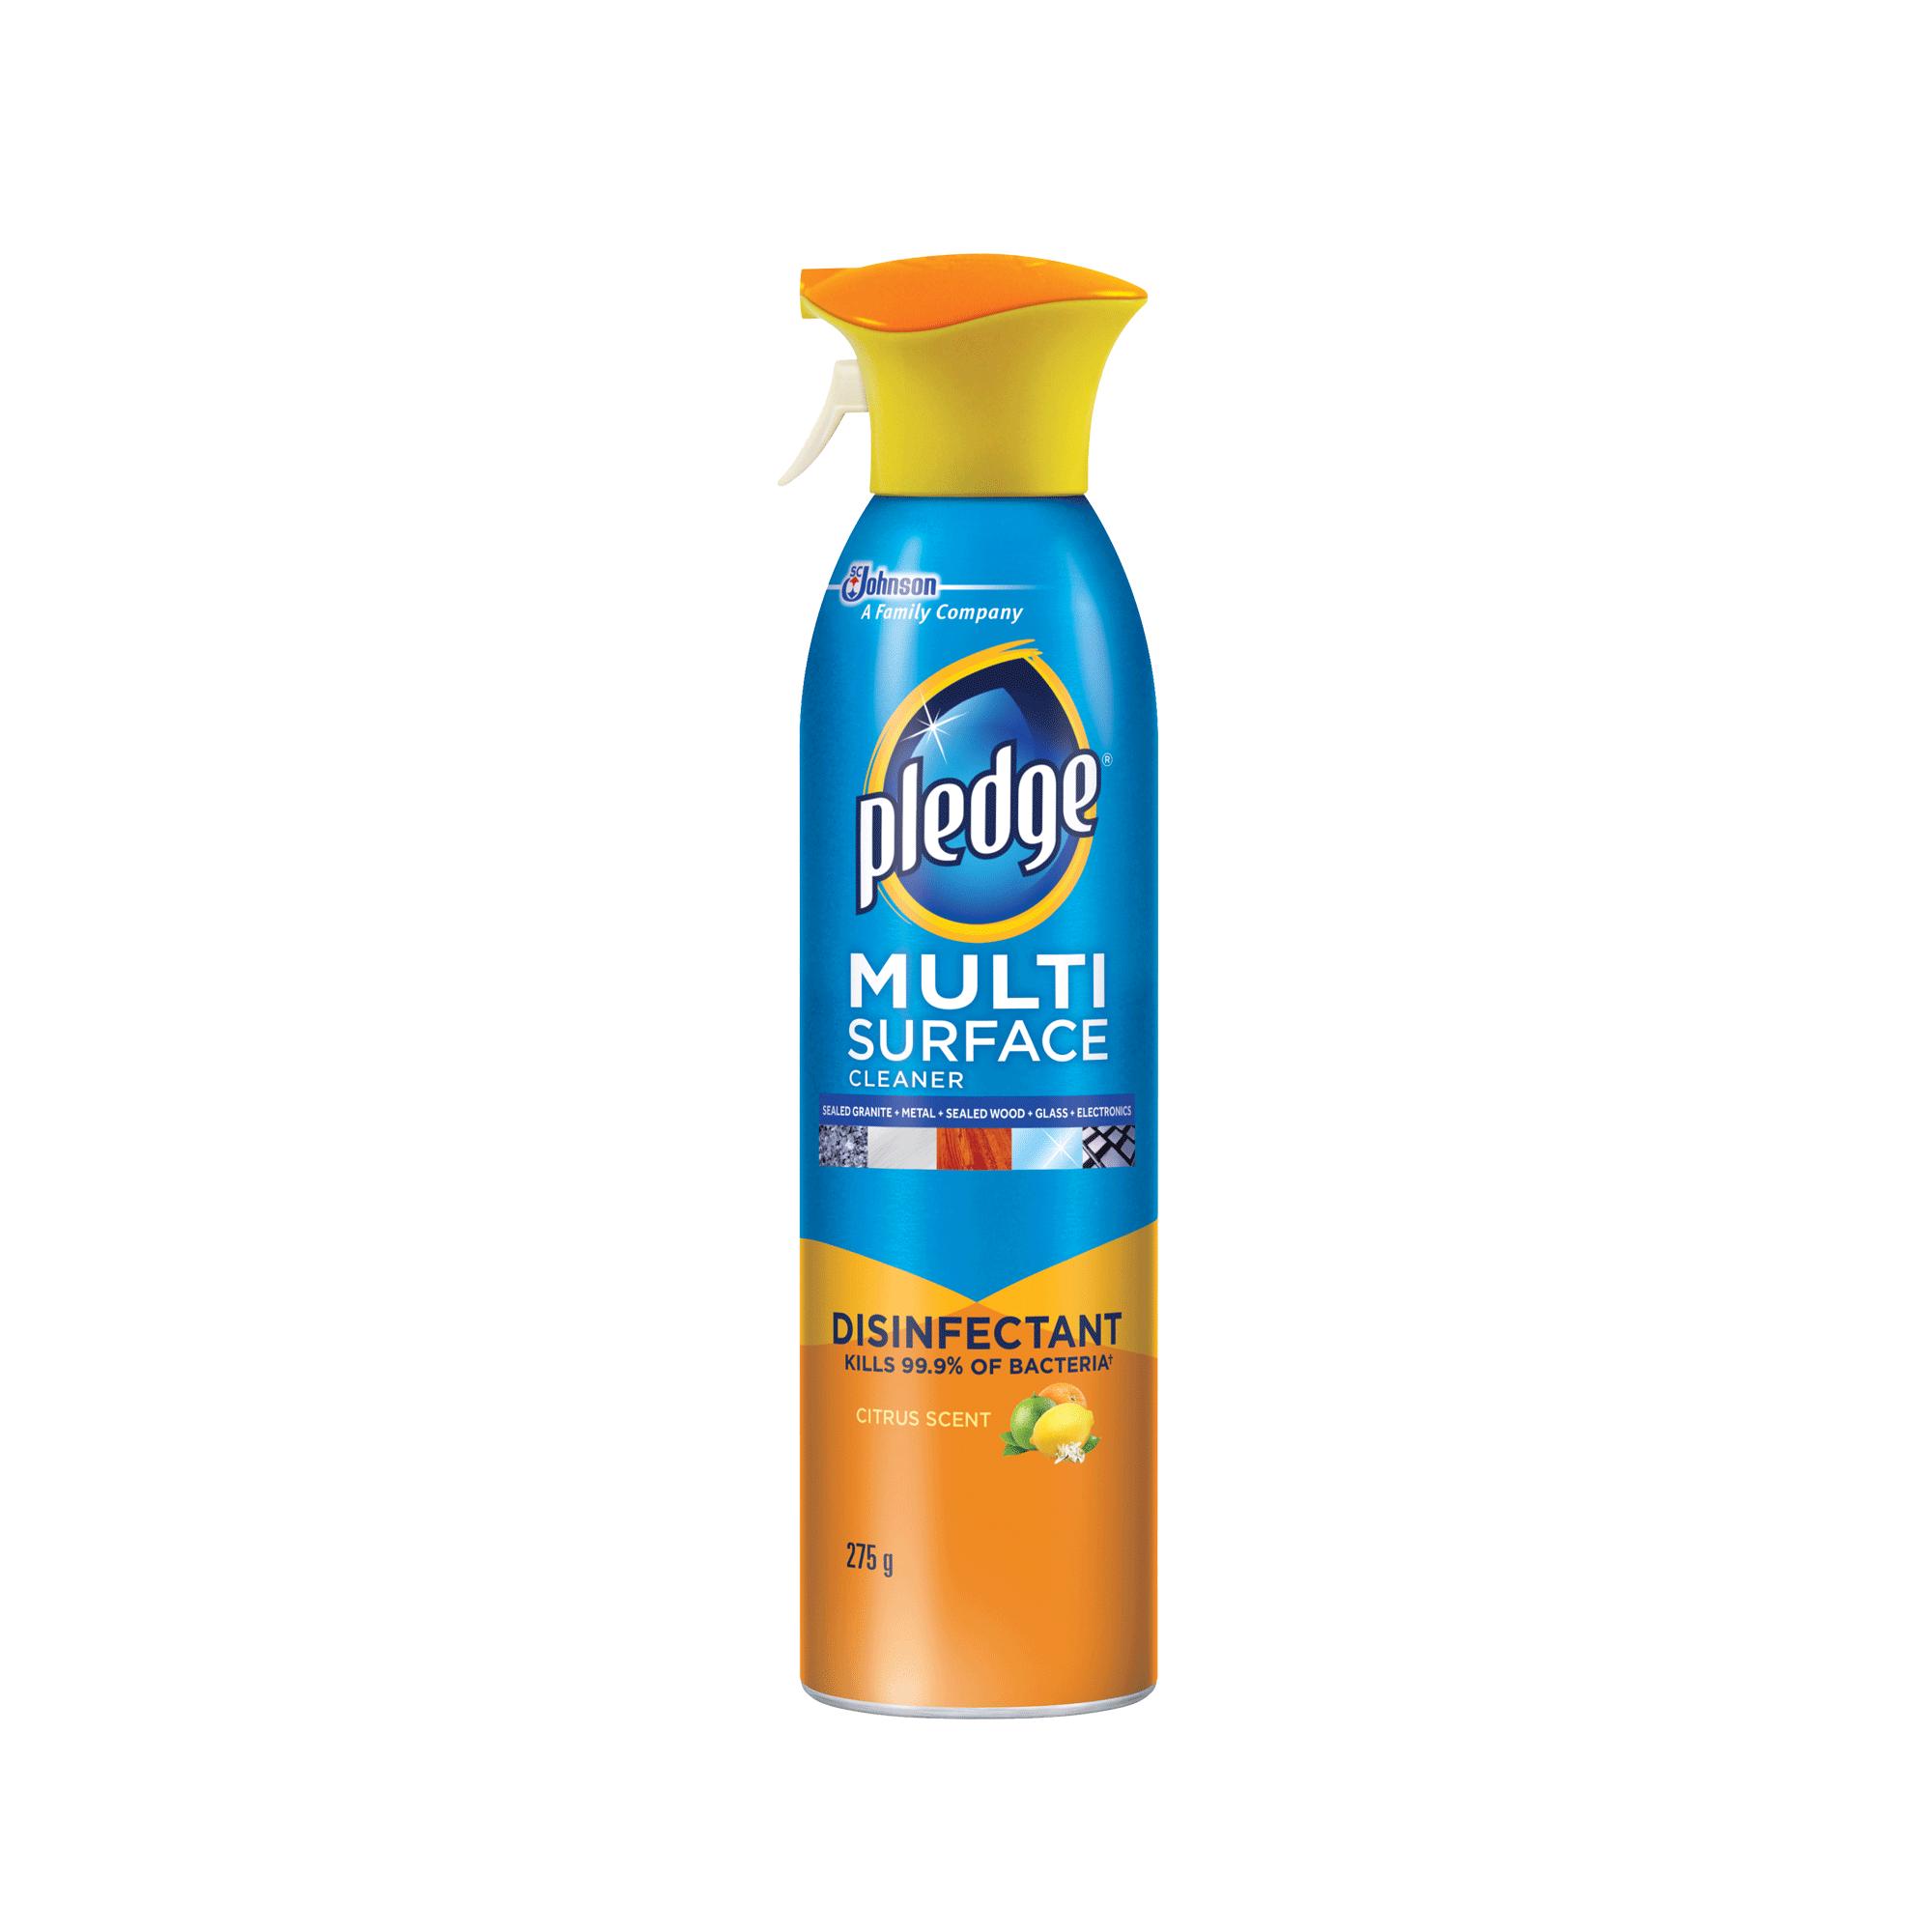 Pledge 174 Multi Surface Cleaner Disinfectant Sc Johnson